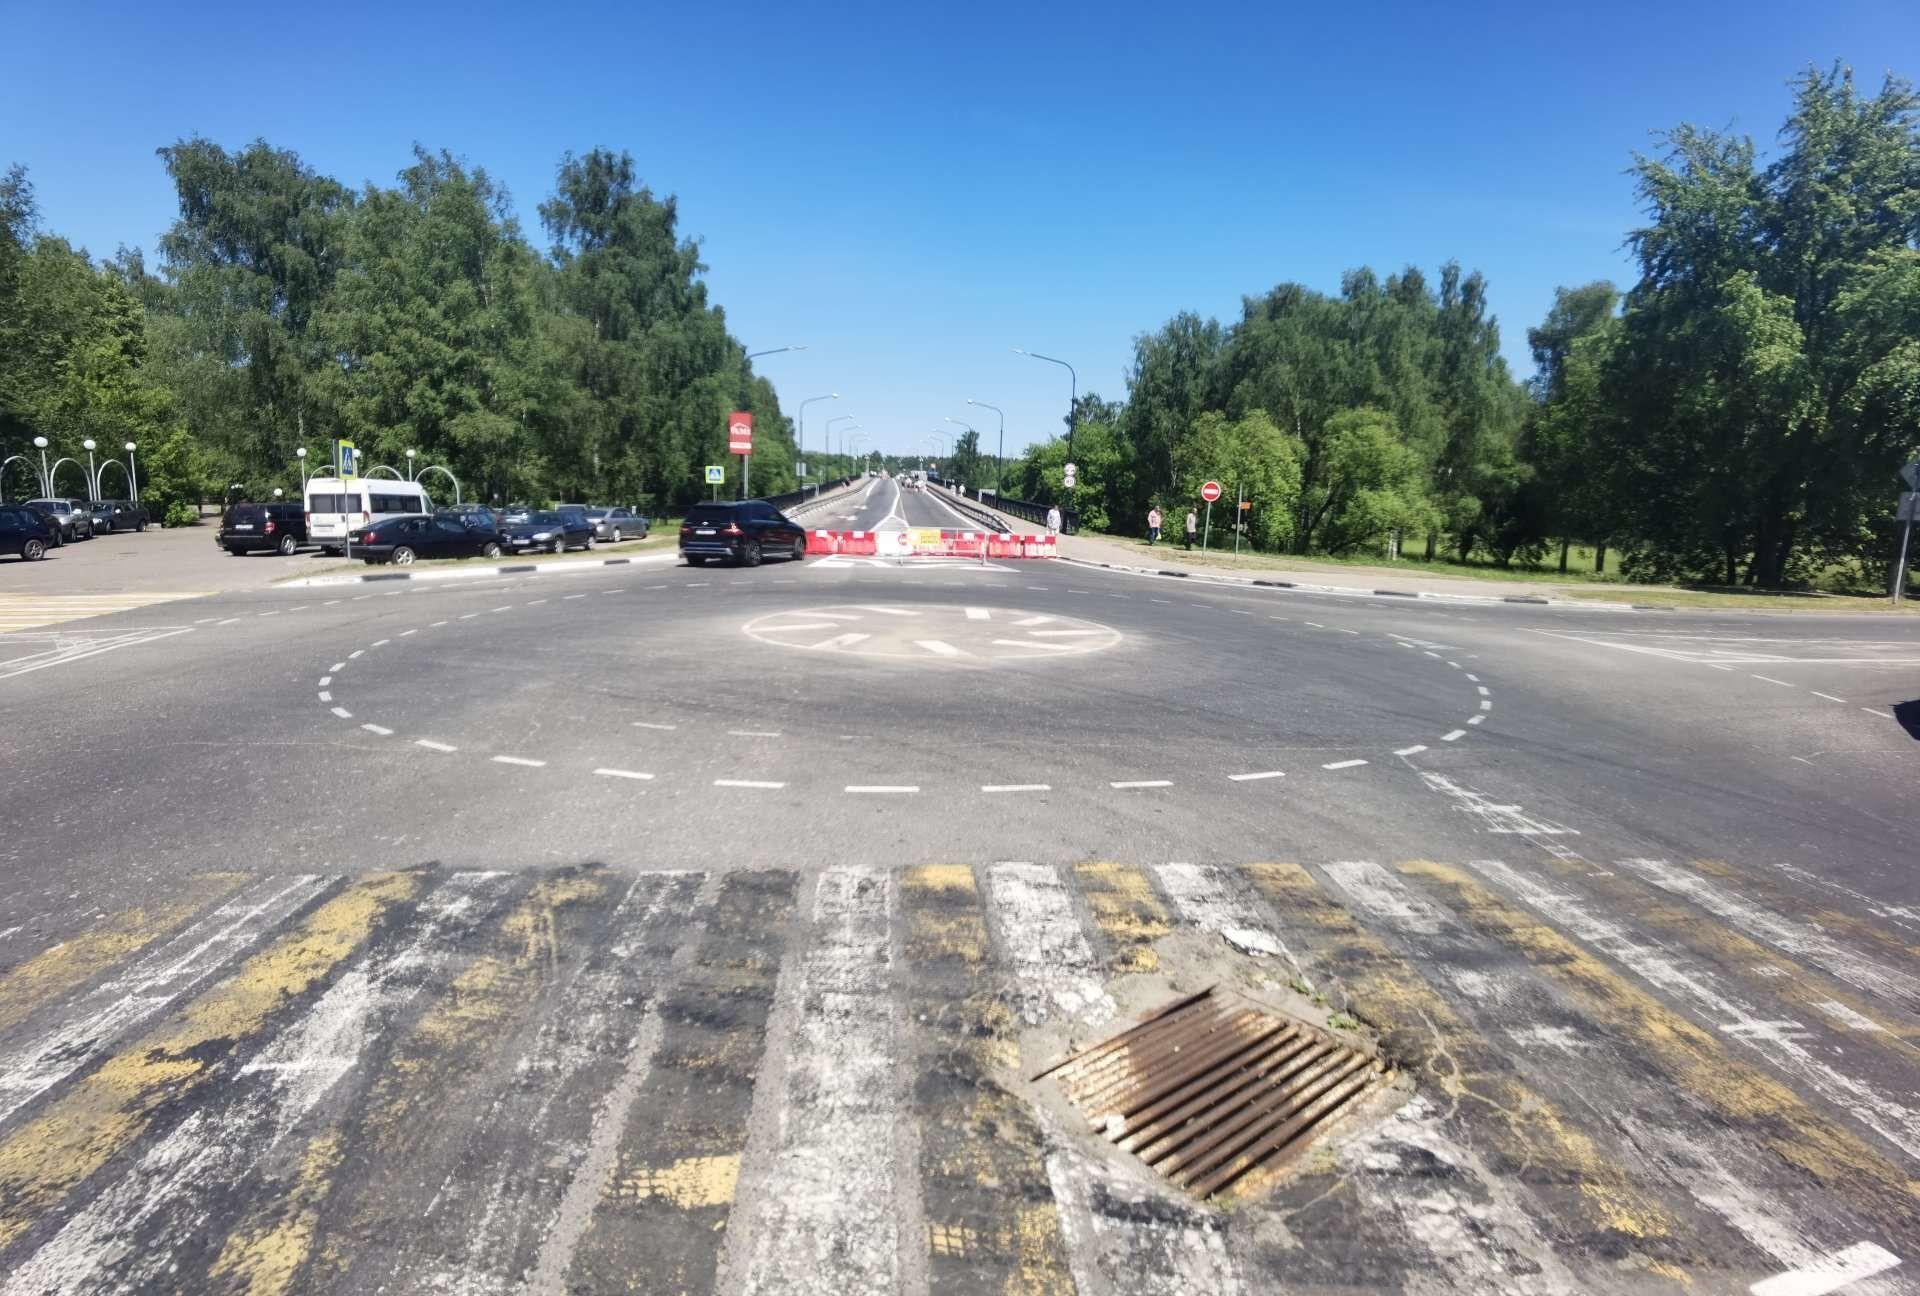 Та самая кольцевая разметка, из-за которой поначалу перед мостом стояли пробки - Sputnik Беларусь, 1920, 29.06.2021